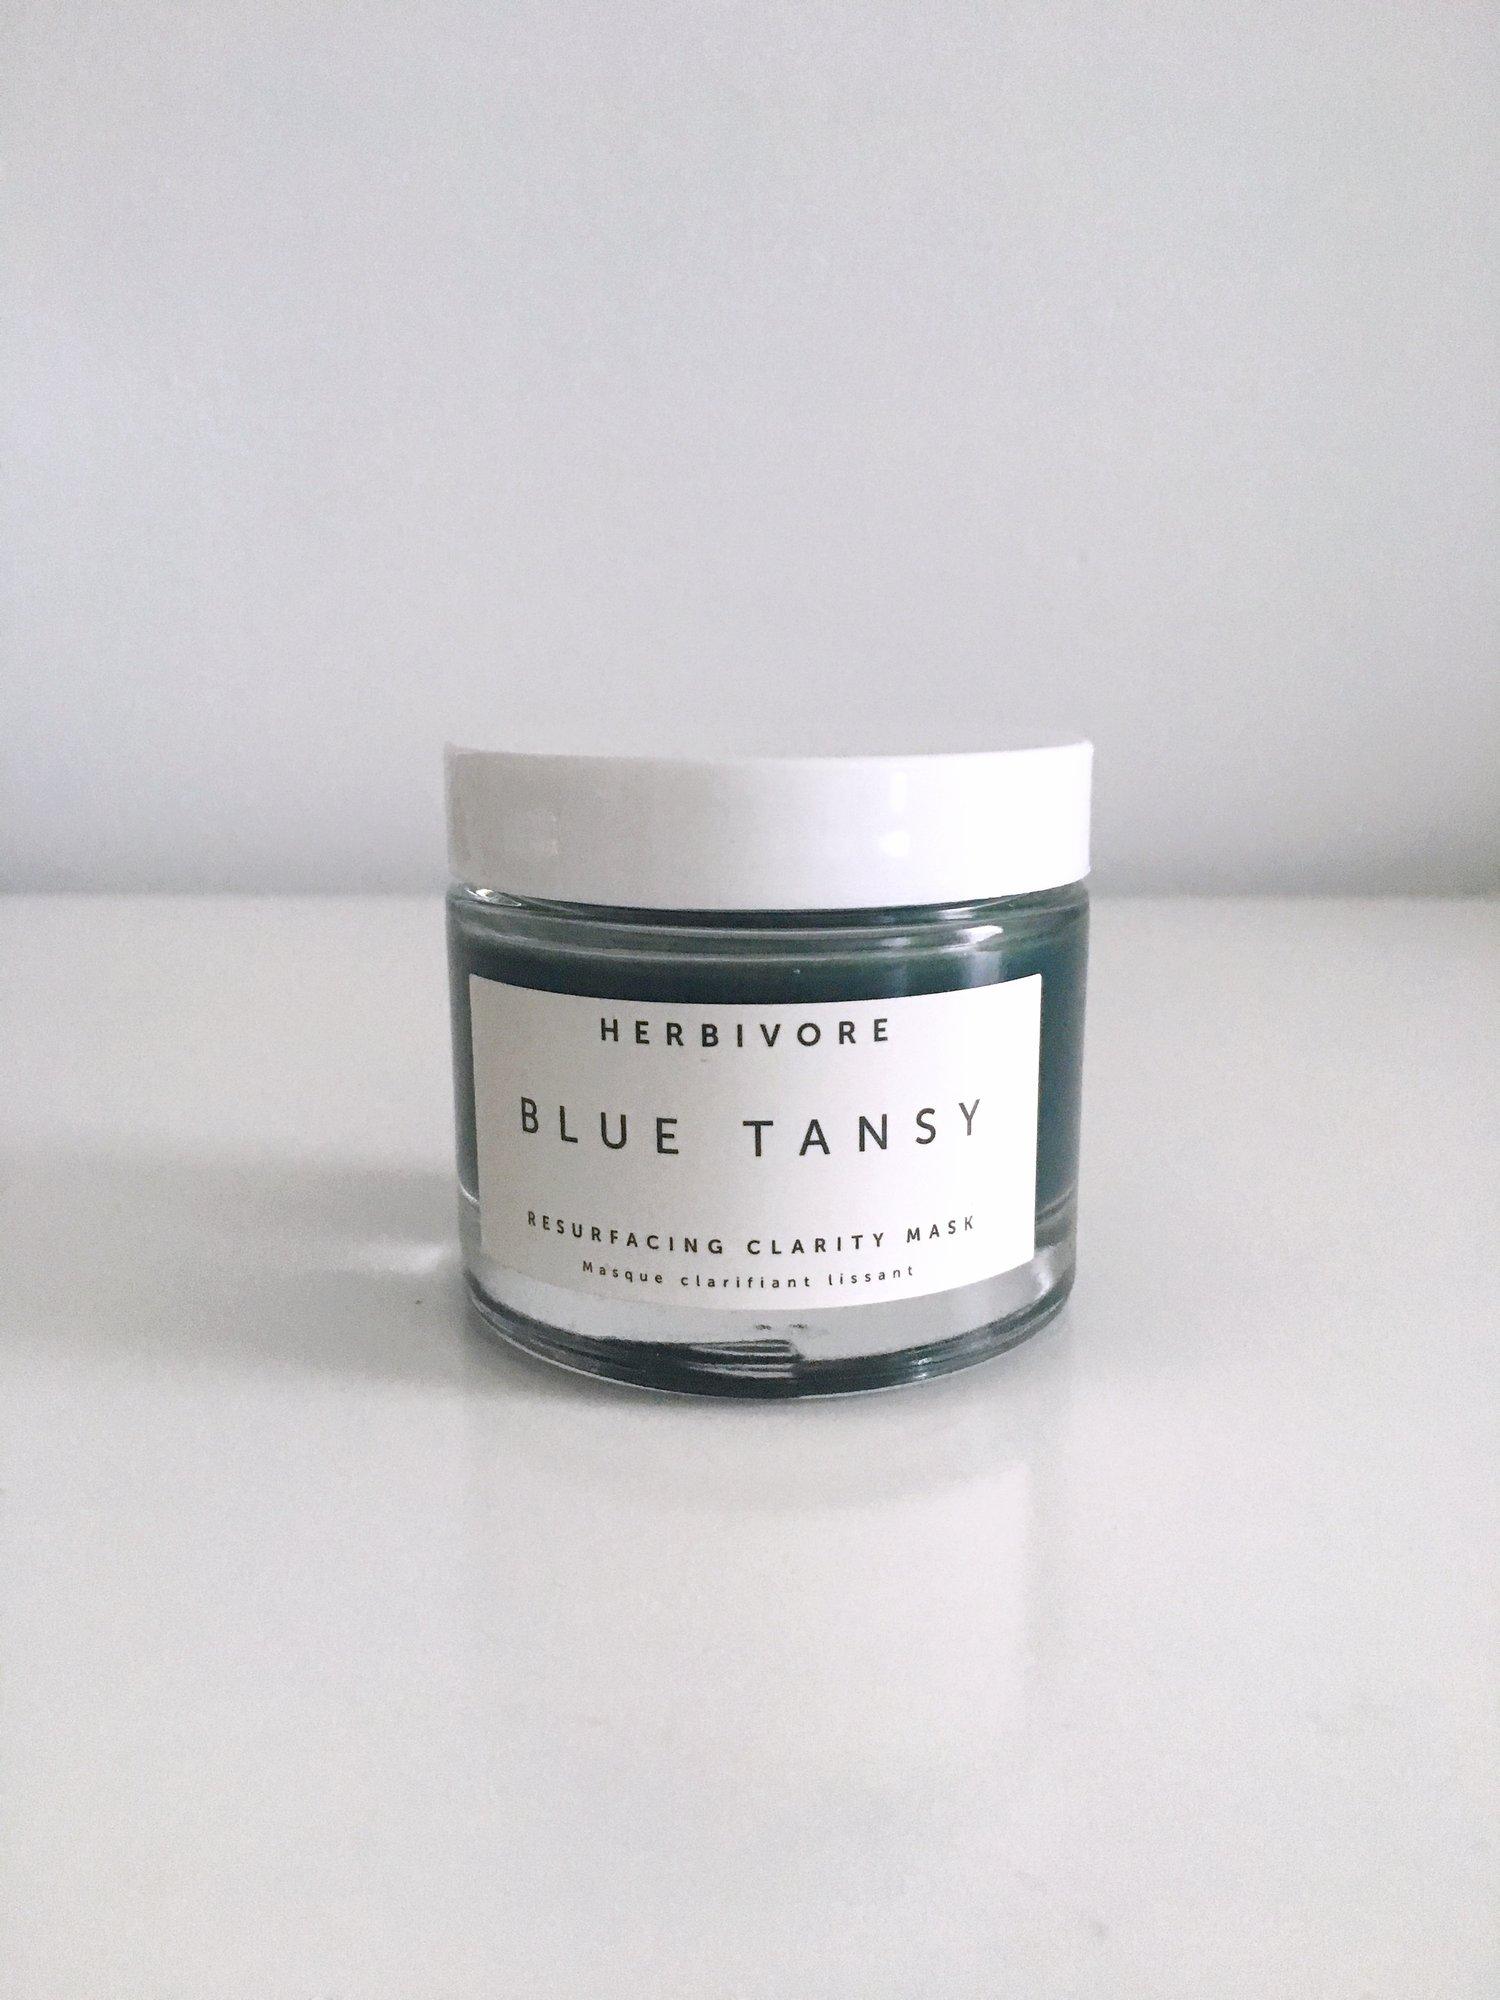 Herbivore Blue Tansy Resurfacing Clarity Mask